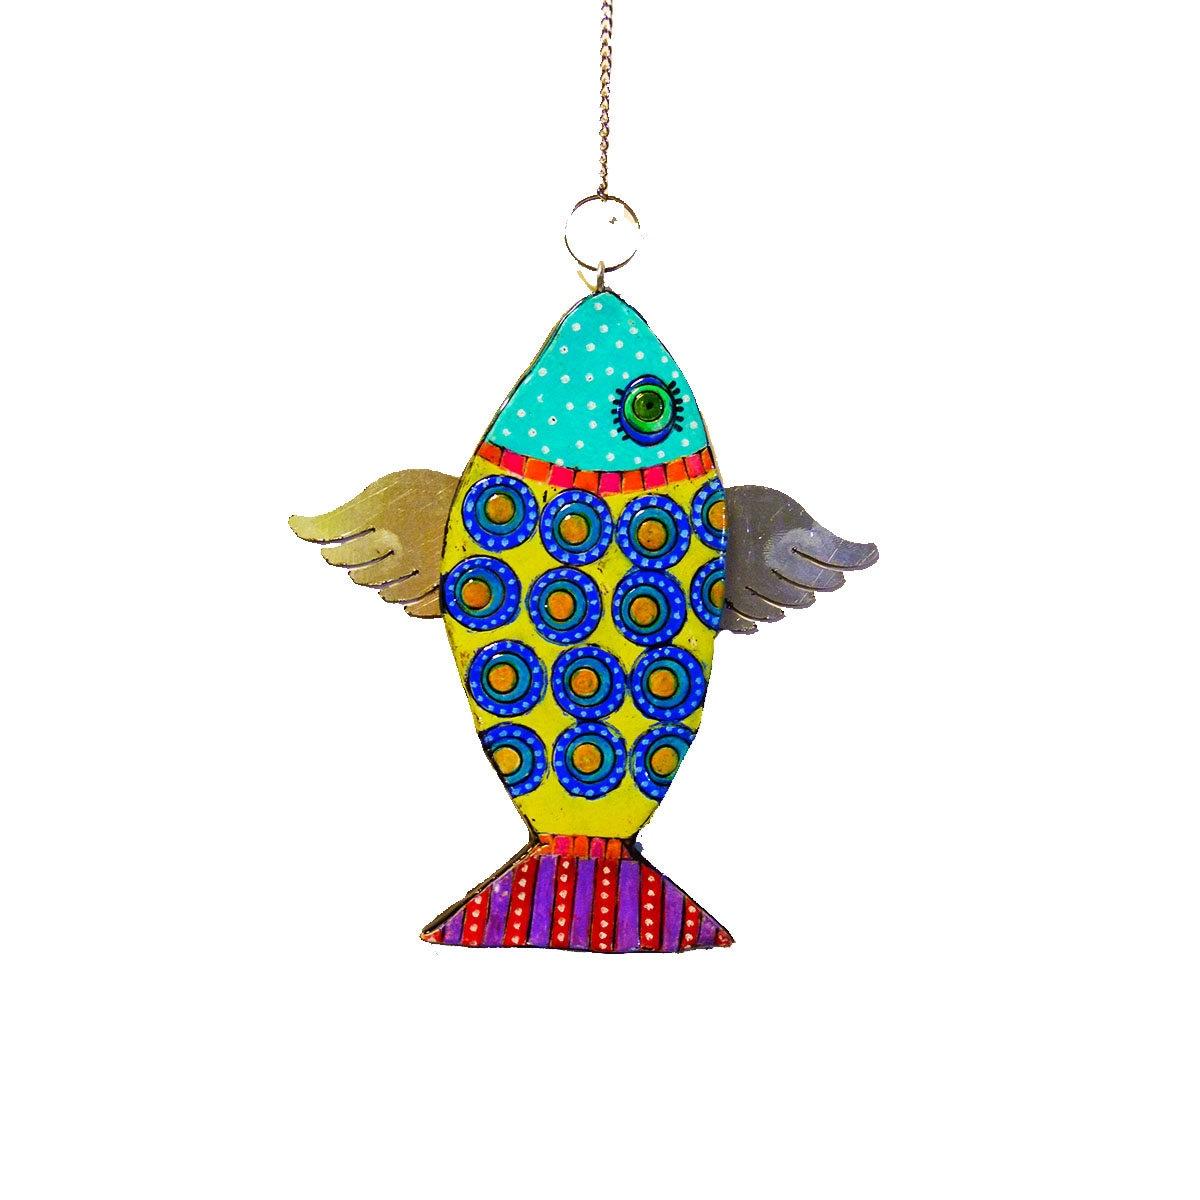 Fish wall hanging fish decoration fish decor fish mobile fish fish wall hanging fish decoration fish decor fish mobile fish wall decor amipublicfo Image collections